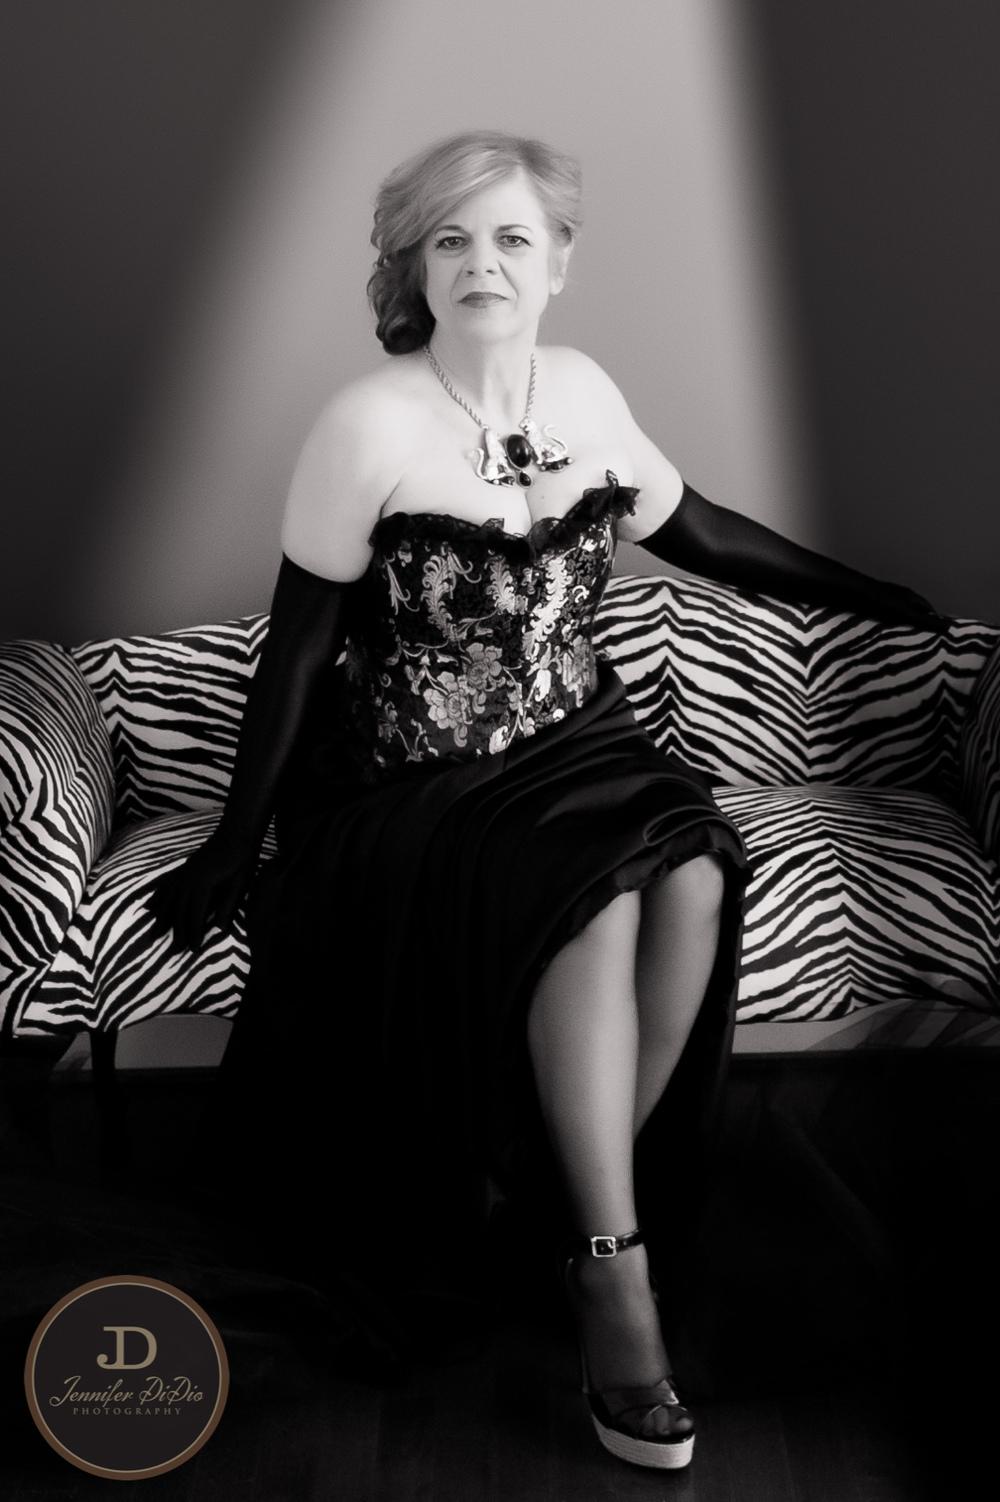 Jennifer.DiDio.Photography.Wroe.Judi.2014-189.jpg